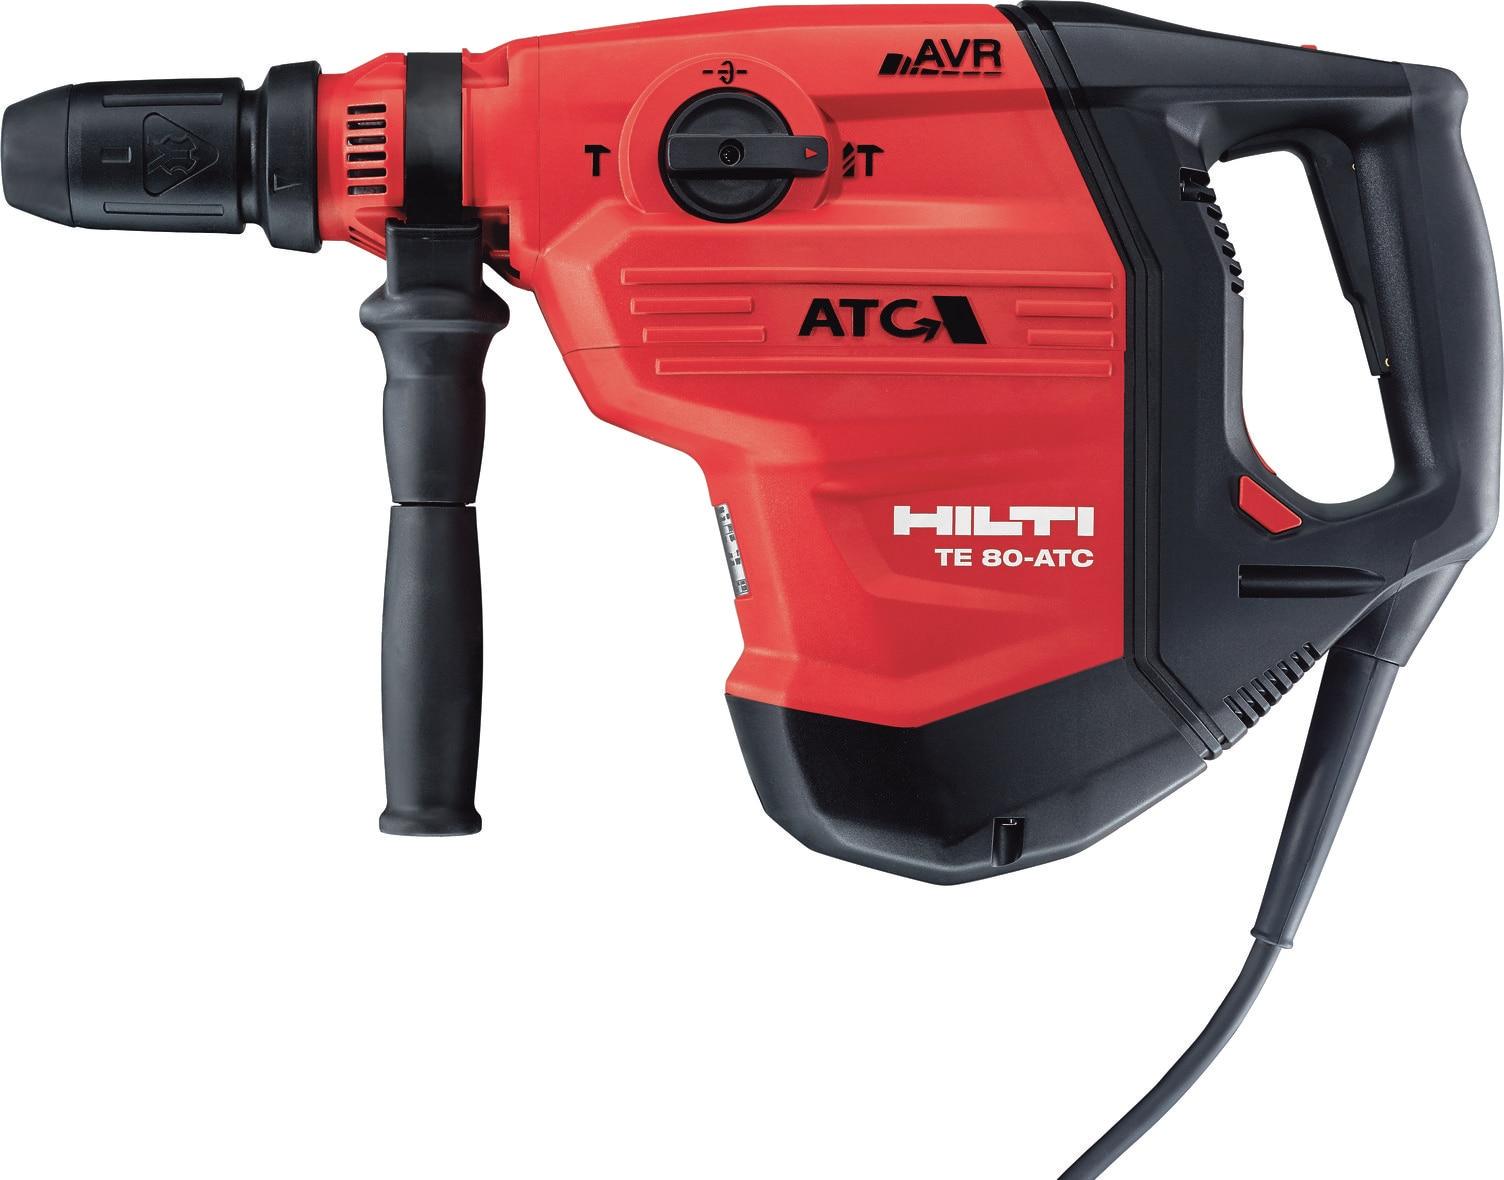 Hilti TE 80-ATC/AVR Combination Hammer